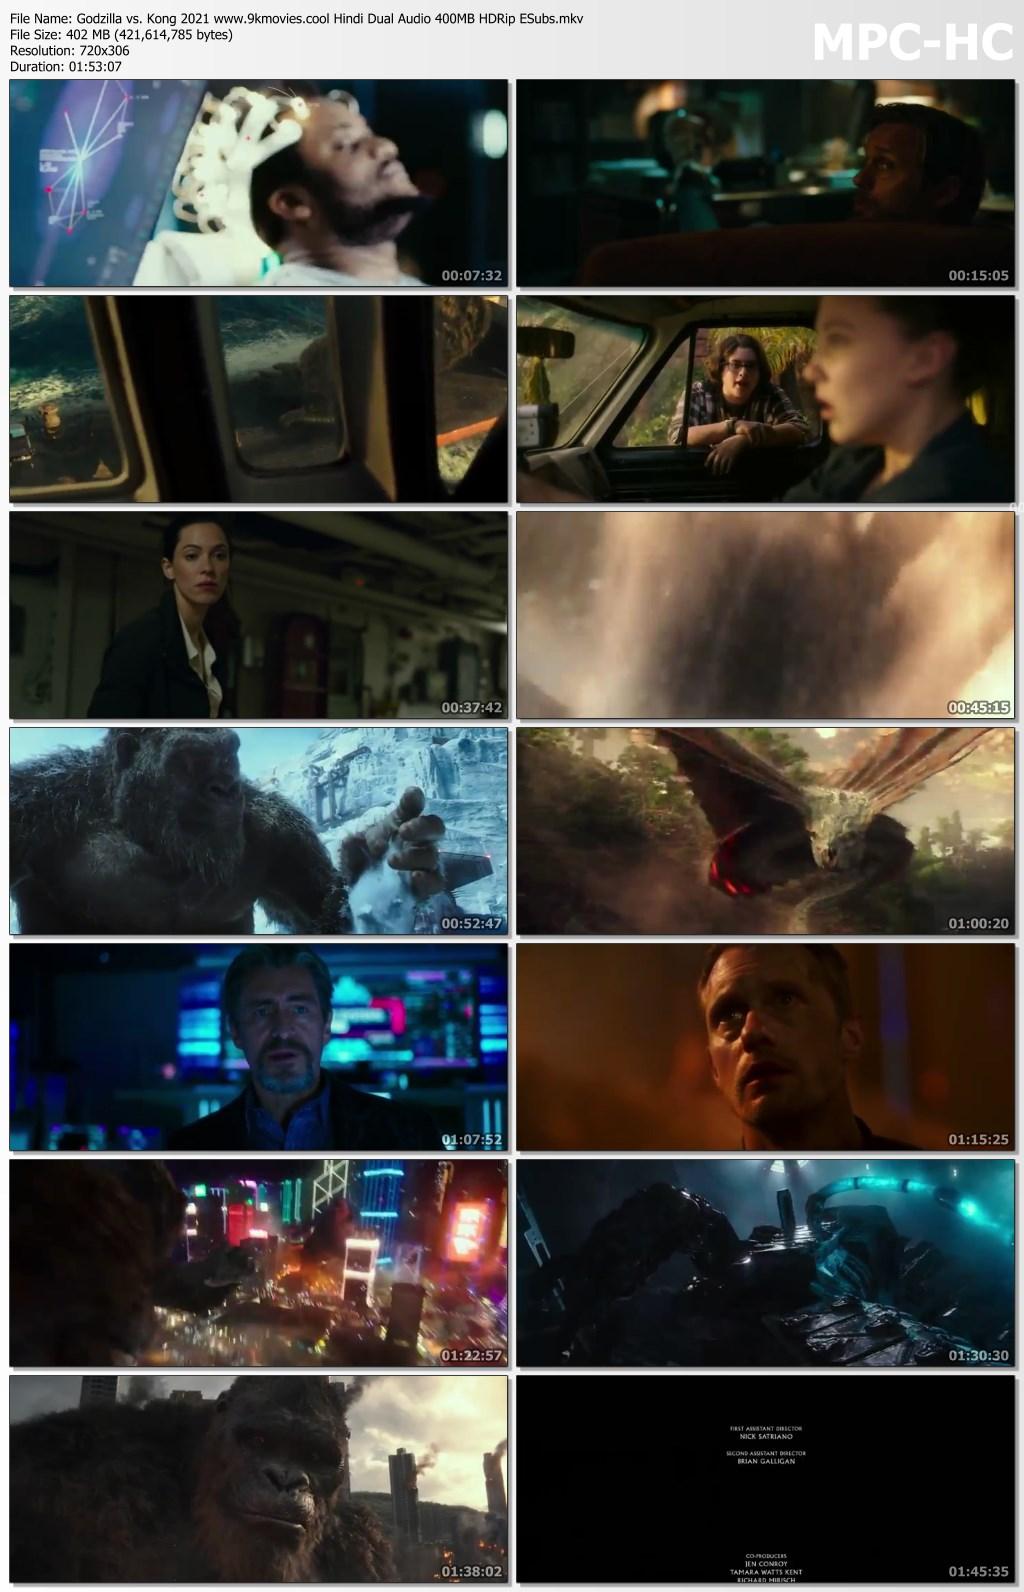 Godzilla vs. Kong 2021 screenshot HDMoviesFair